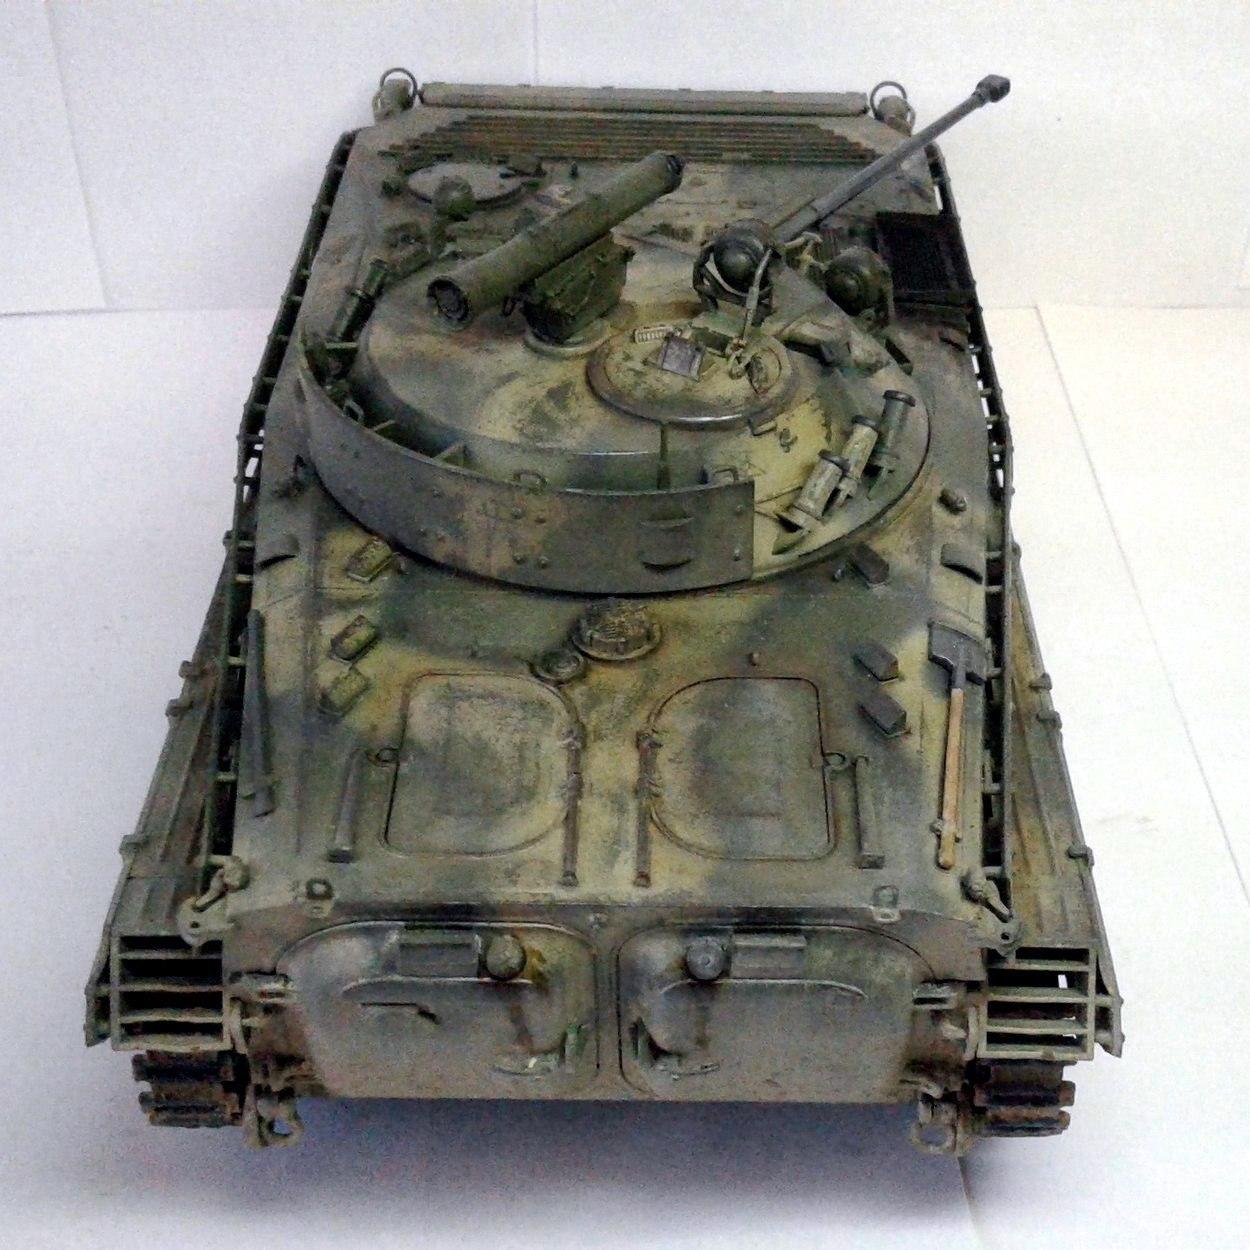 BMP-2D Trumpeter 1/35 - ГОТОВО Sq6DrEX5u5k